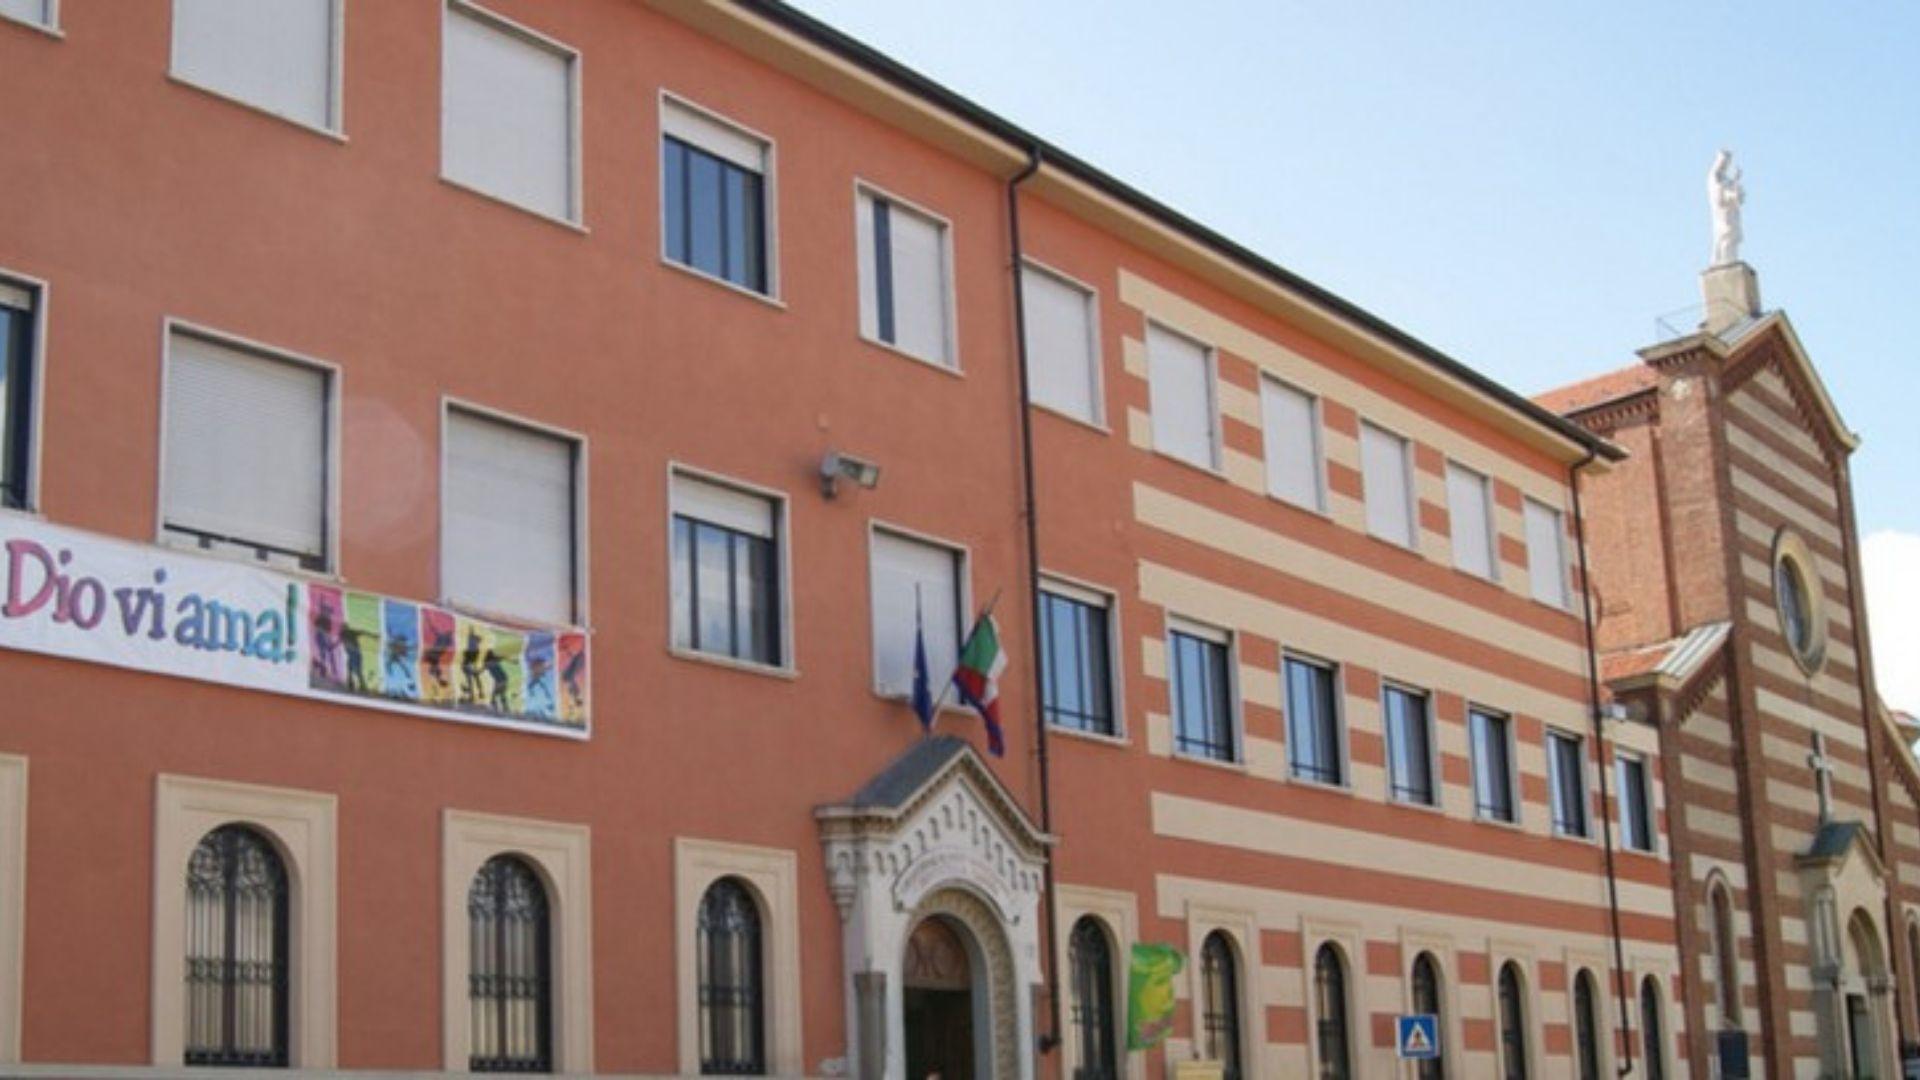 Istituto Santa Teresa. FMA